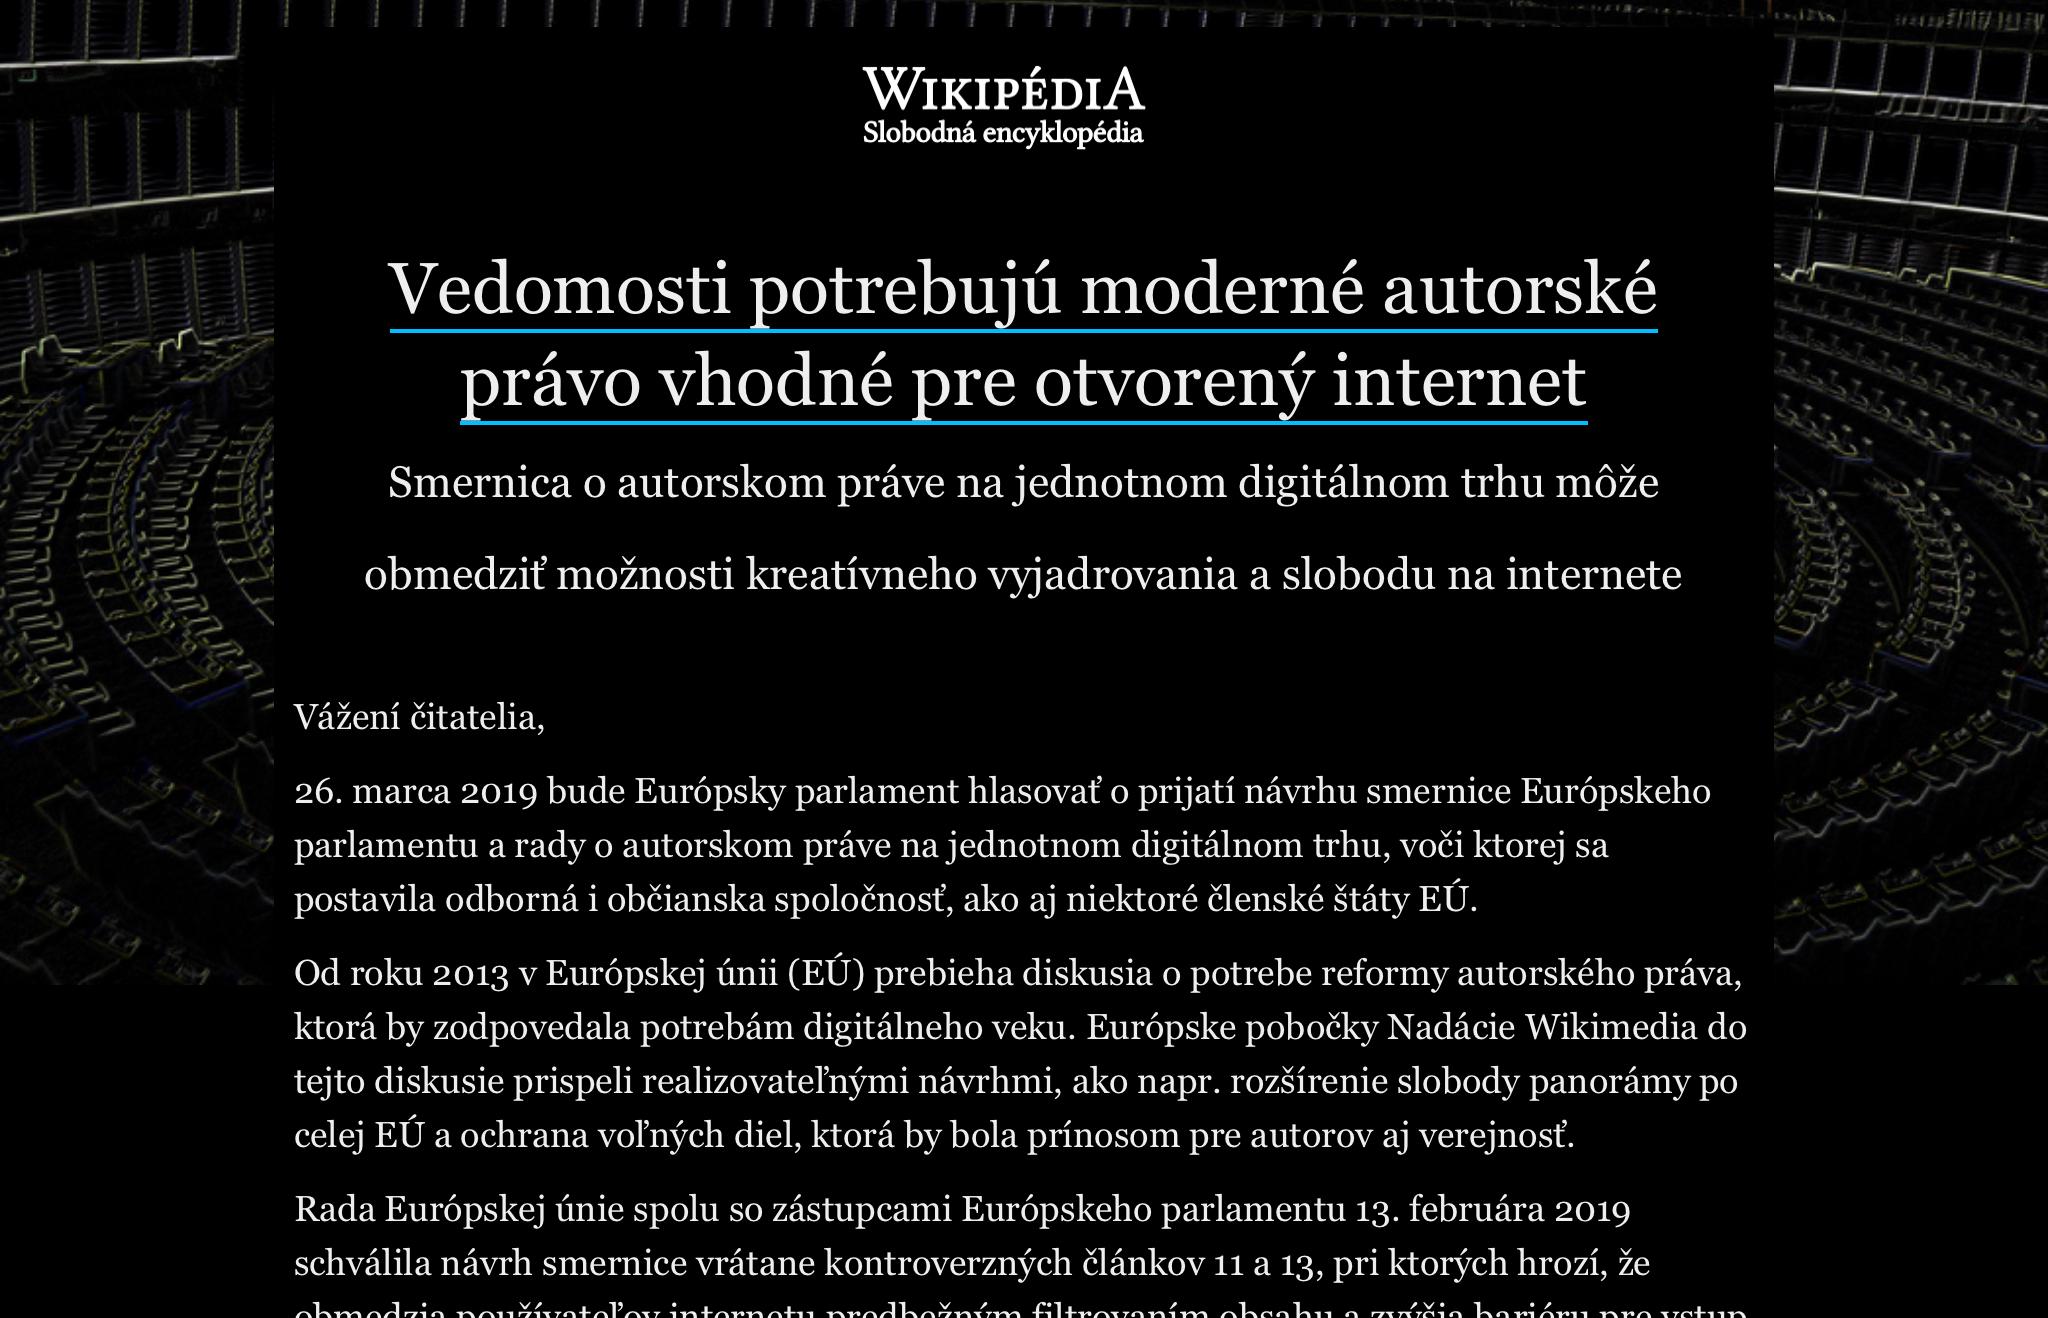 Wikipédia nefunguje